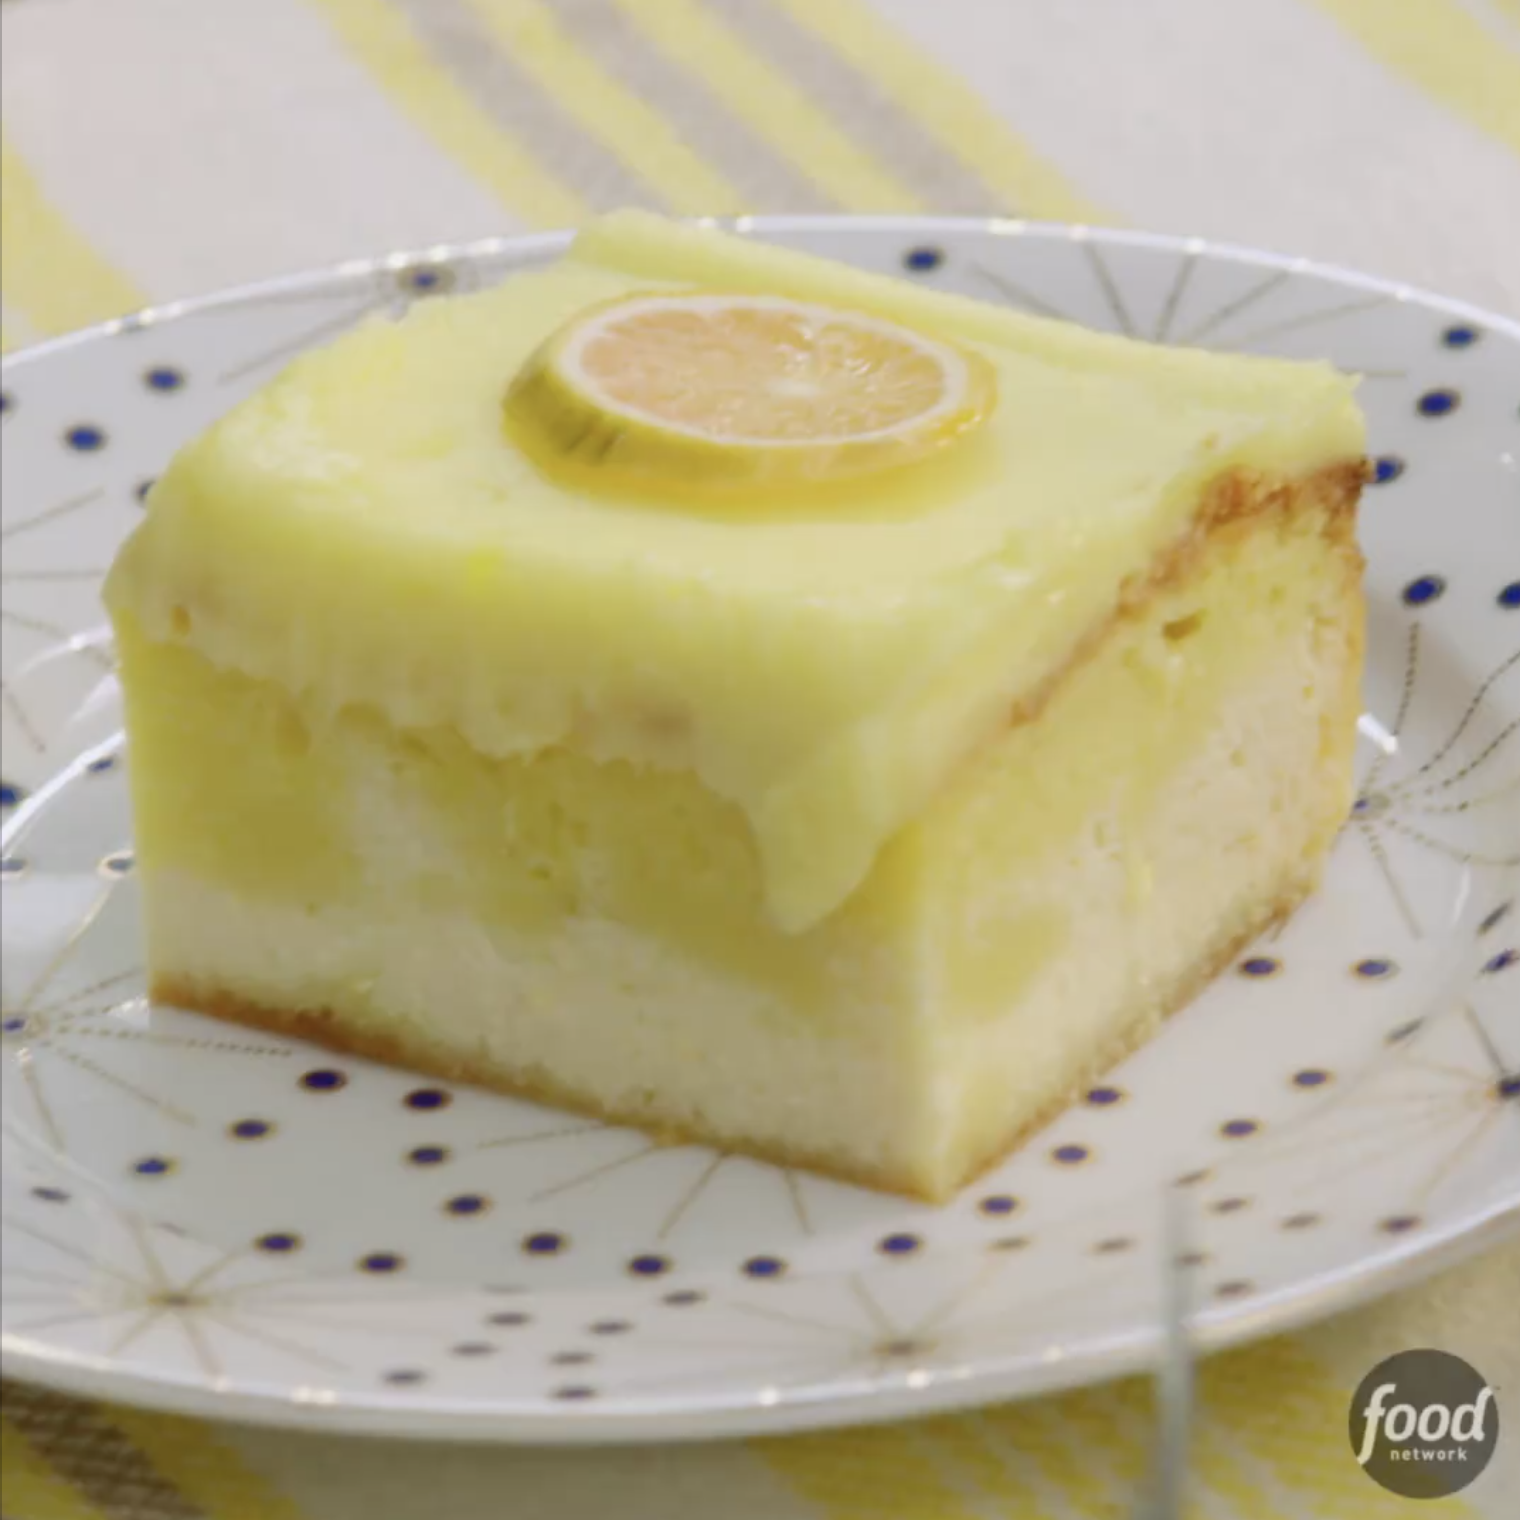 How to Make Valerie Bertinelli's Lemon Love Cake